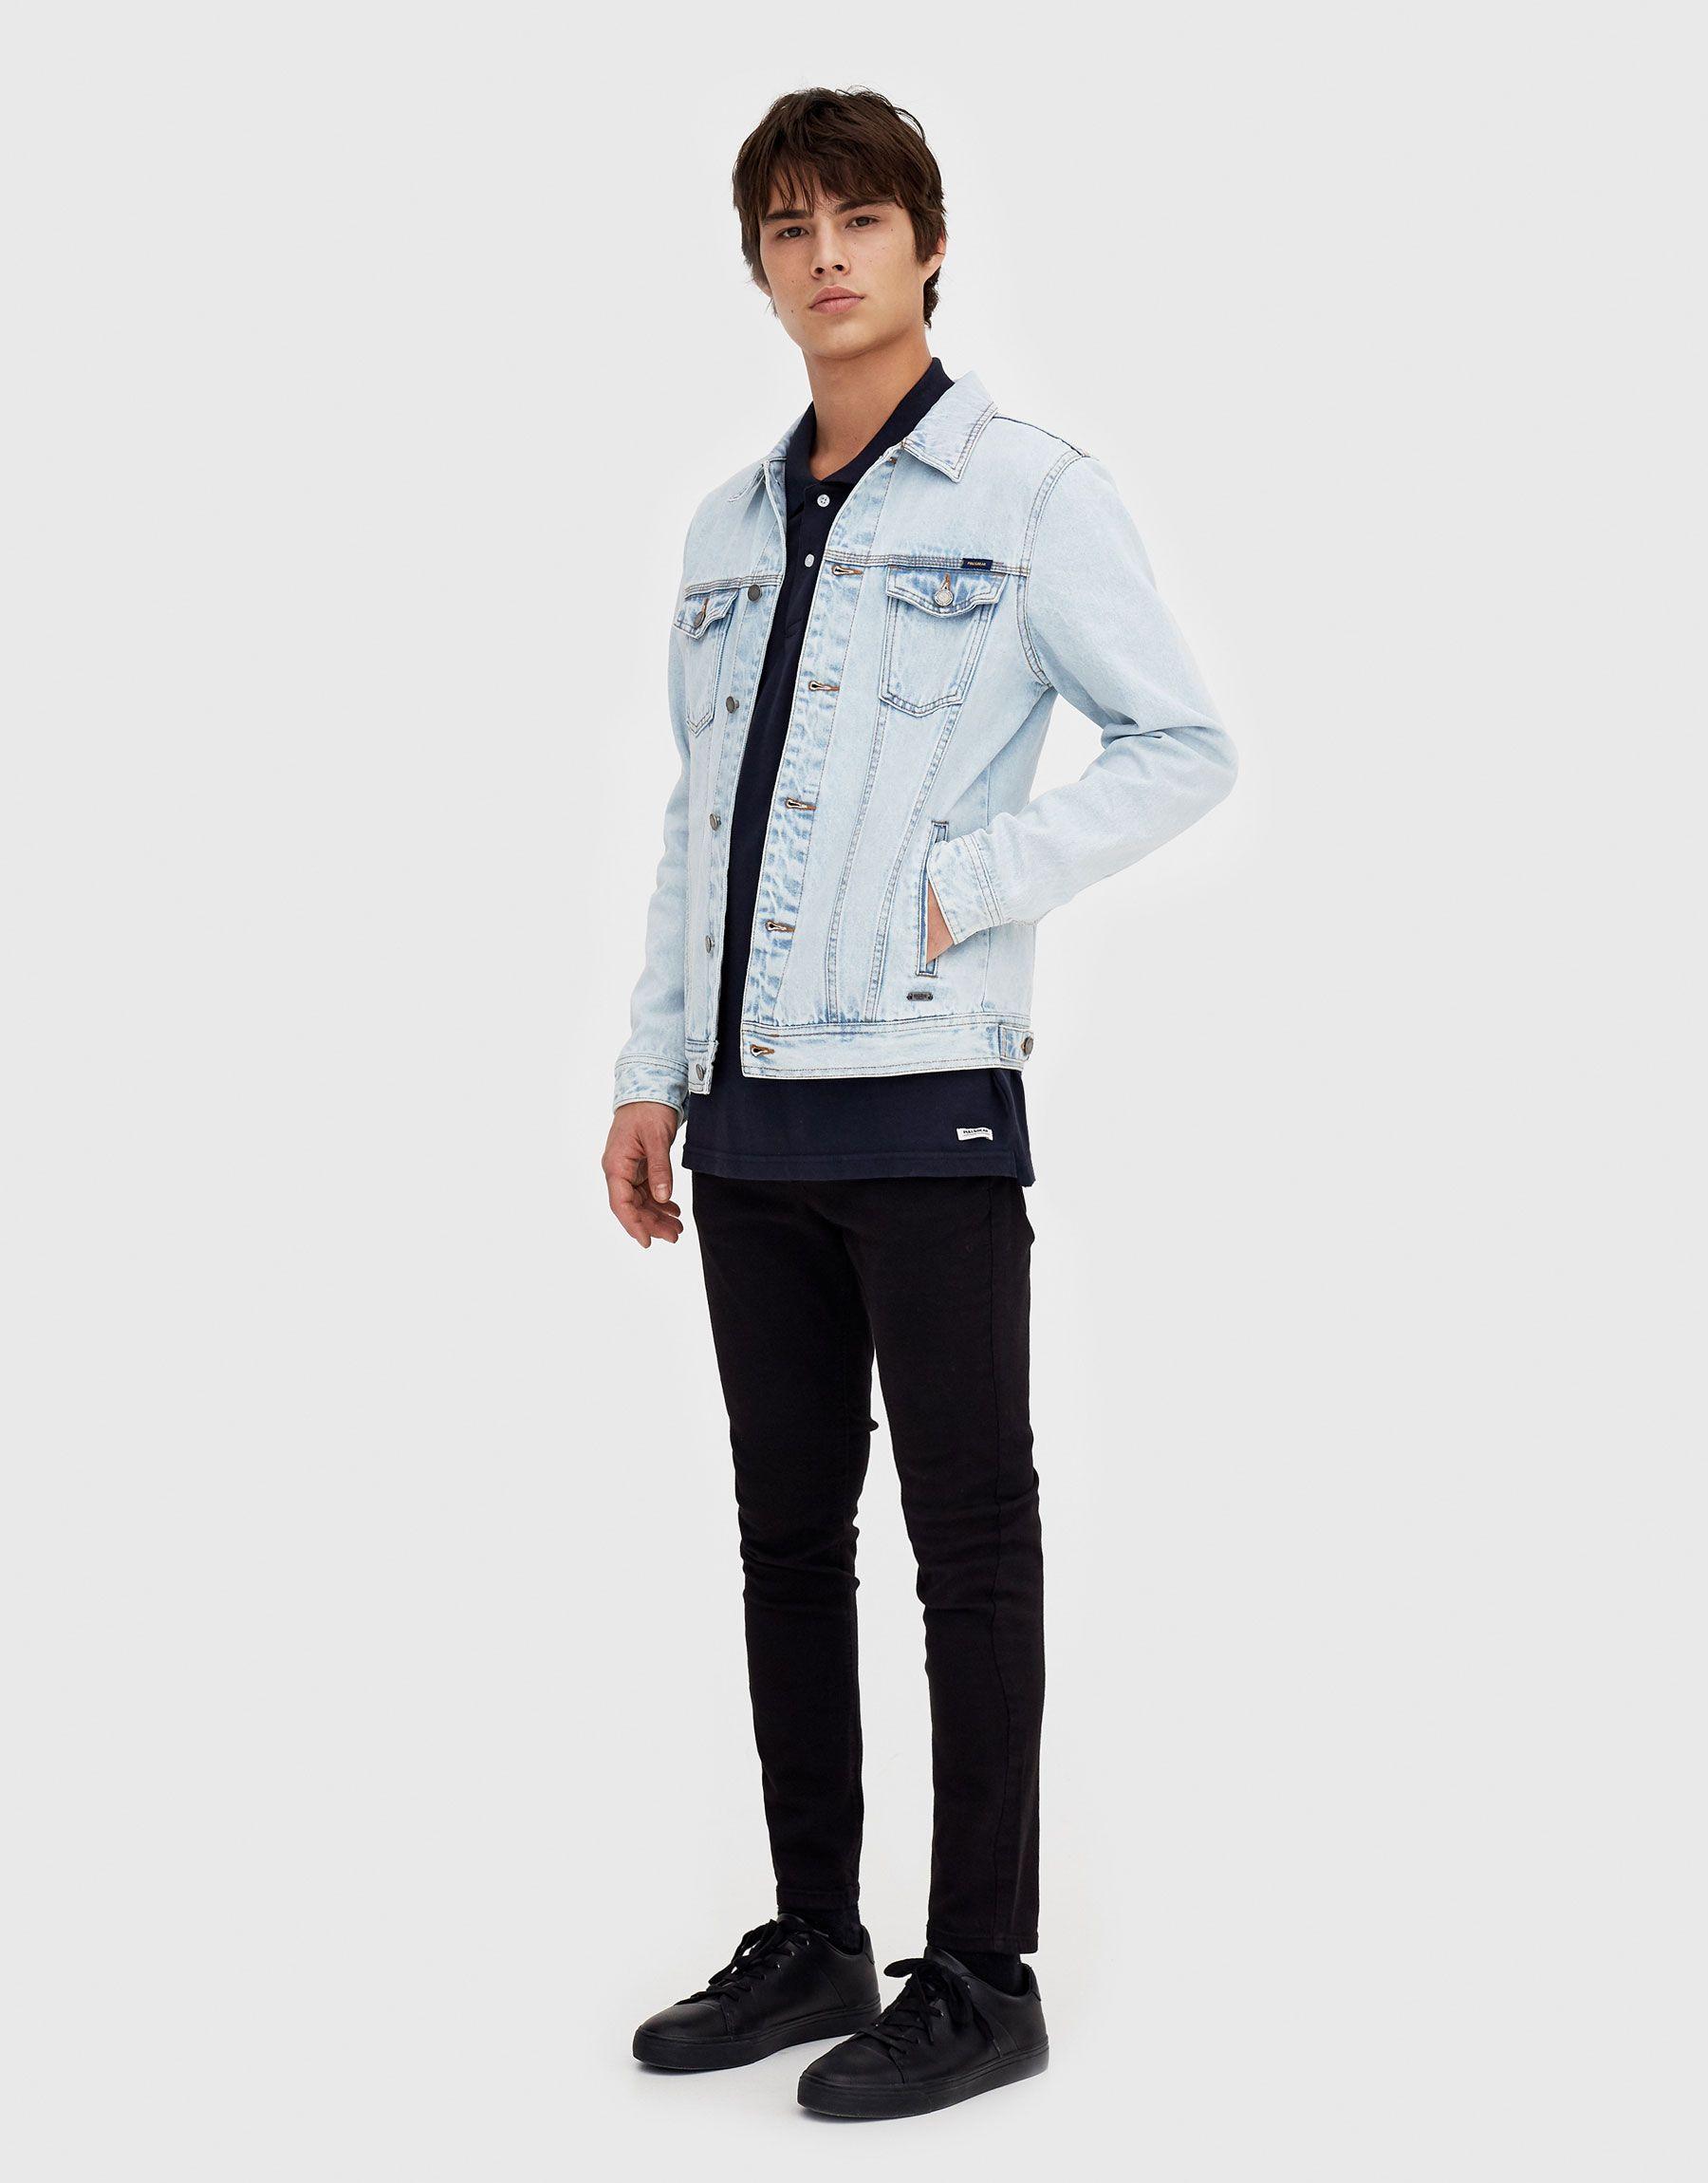 Faded Light Blue Denim Jacket Blue Denim Jacket Outfit Denim Jacket Men Jeans Outfit Men [ 2300 x 1800 Pixel ]